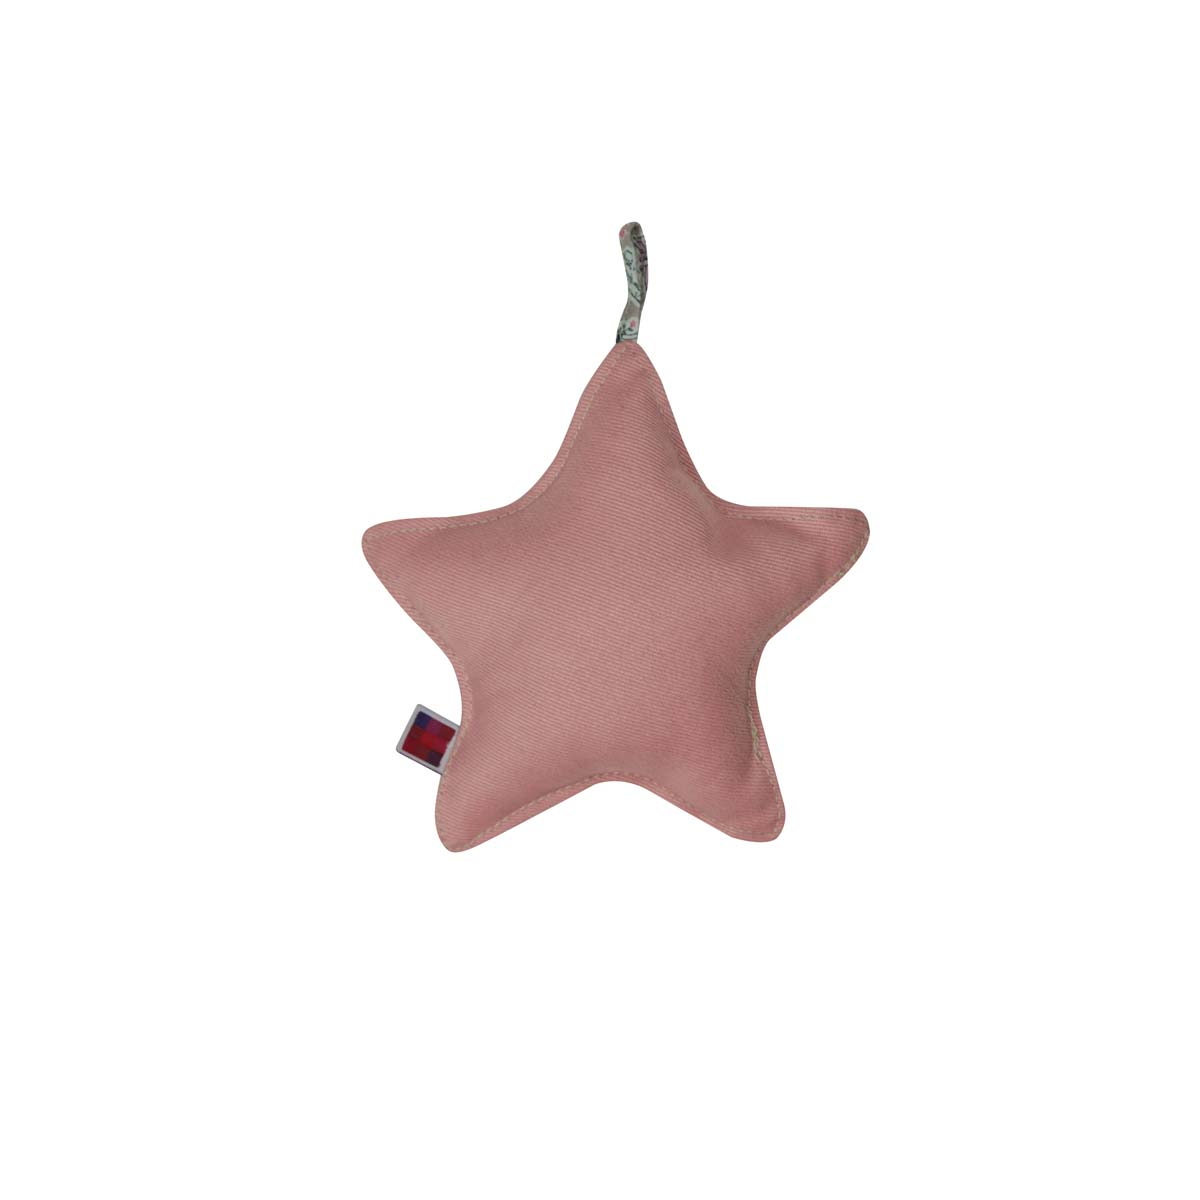 Almofada Star Pp Tecido Liberty Alice 01 V